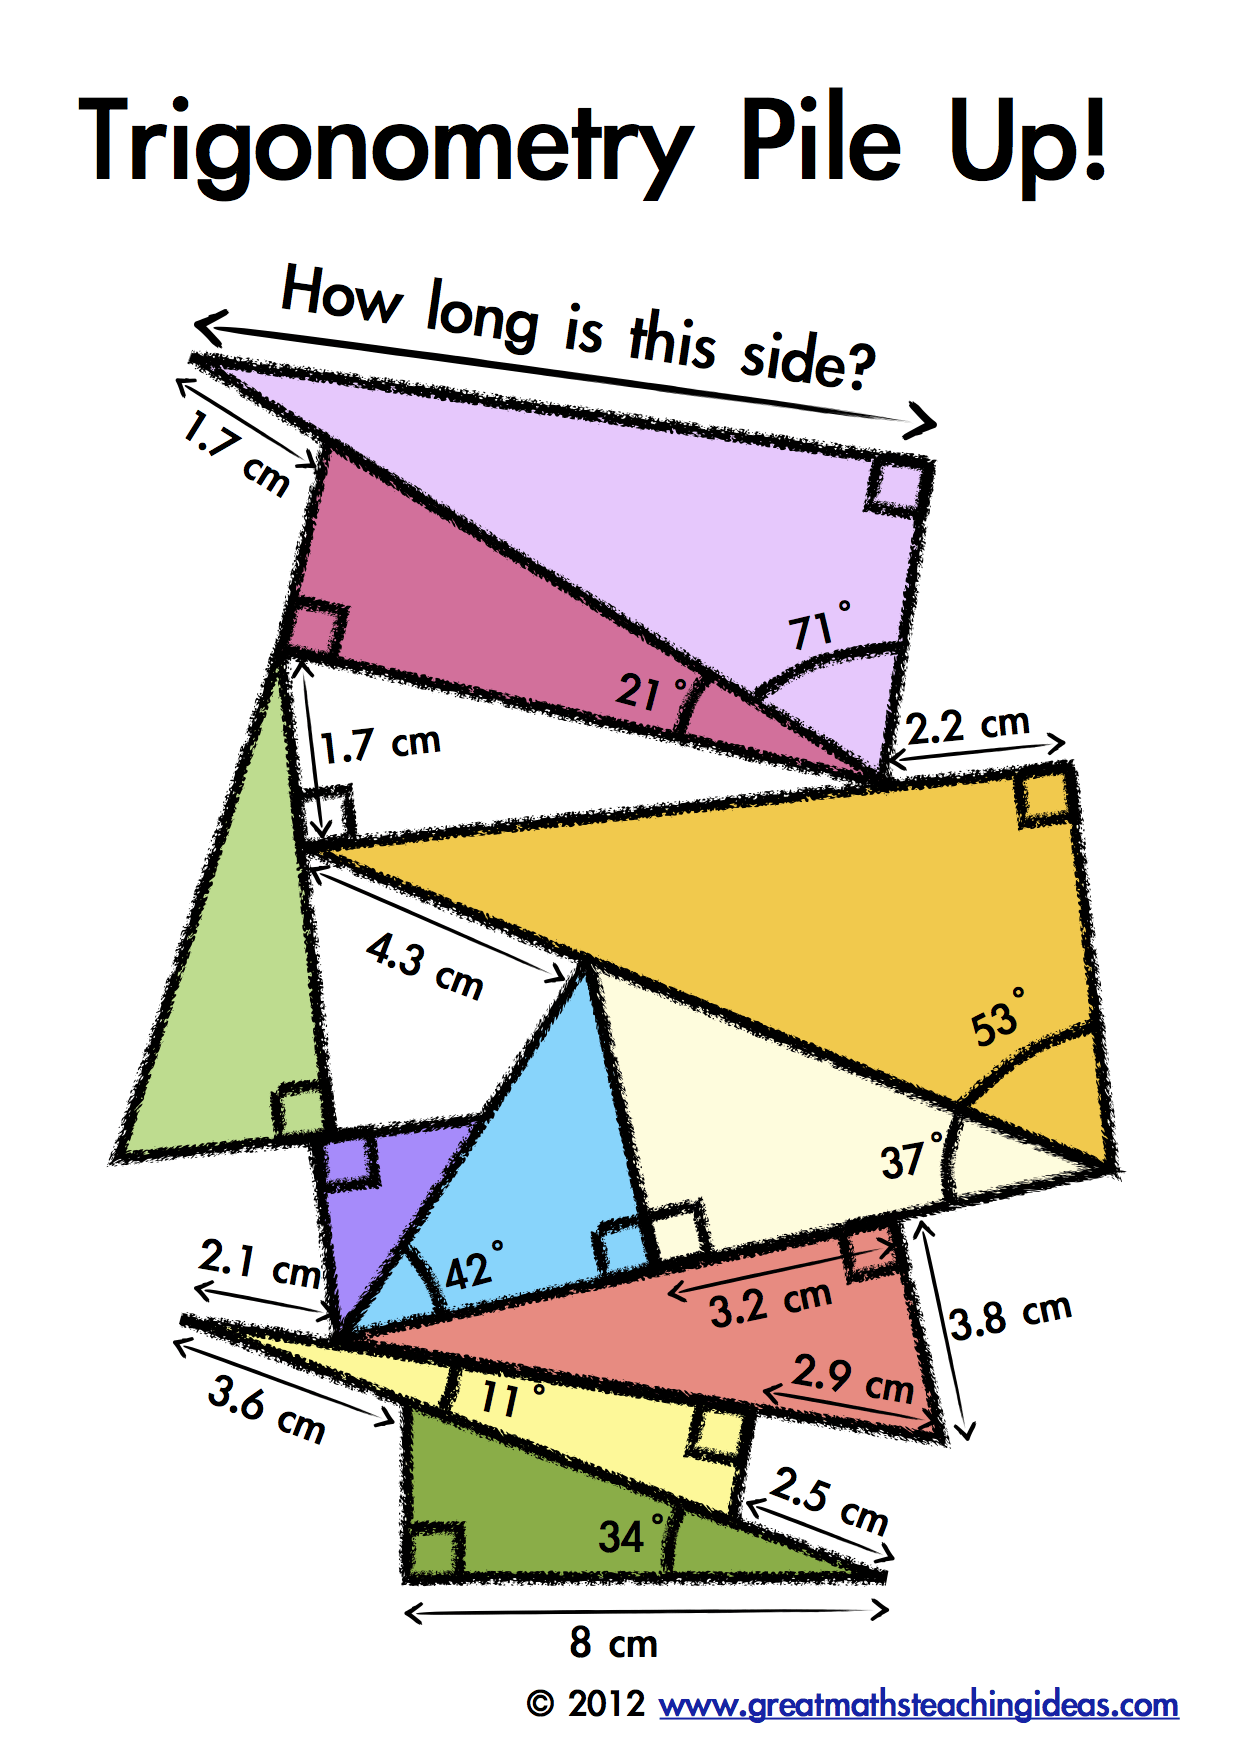 Trigonometry Pile Up | School Stuff | Math classroom, Math